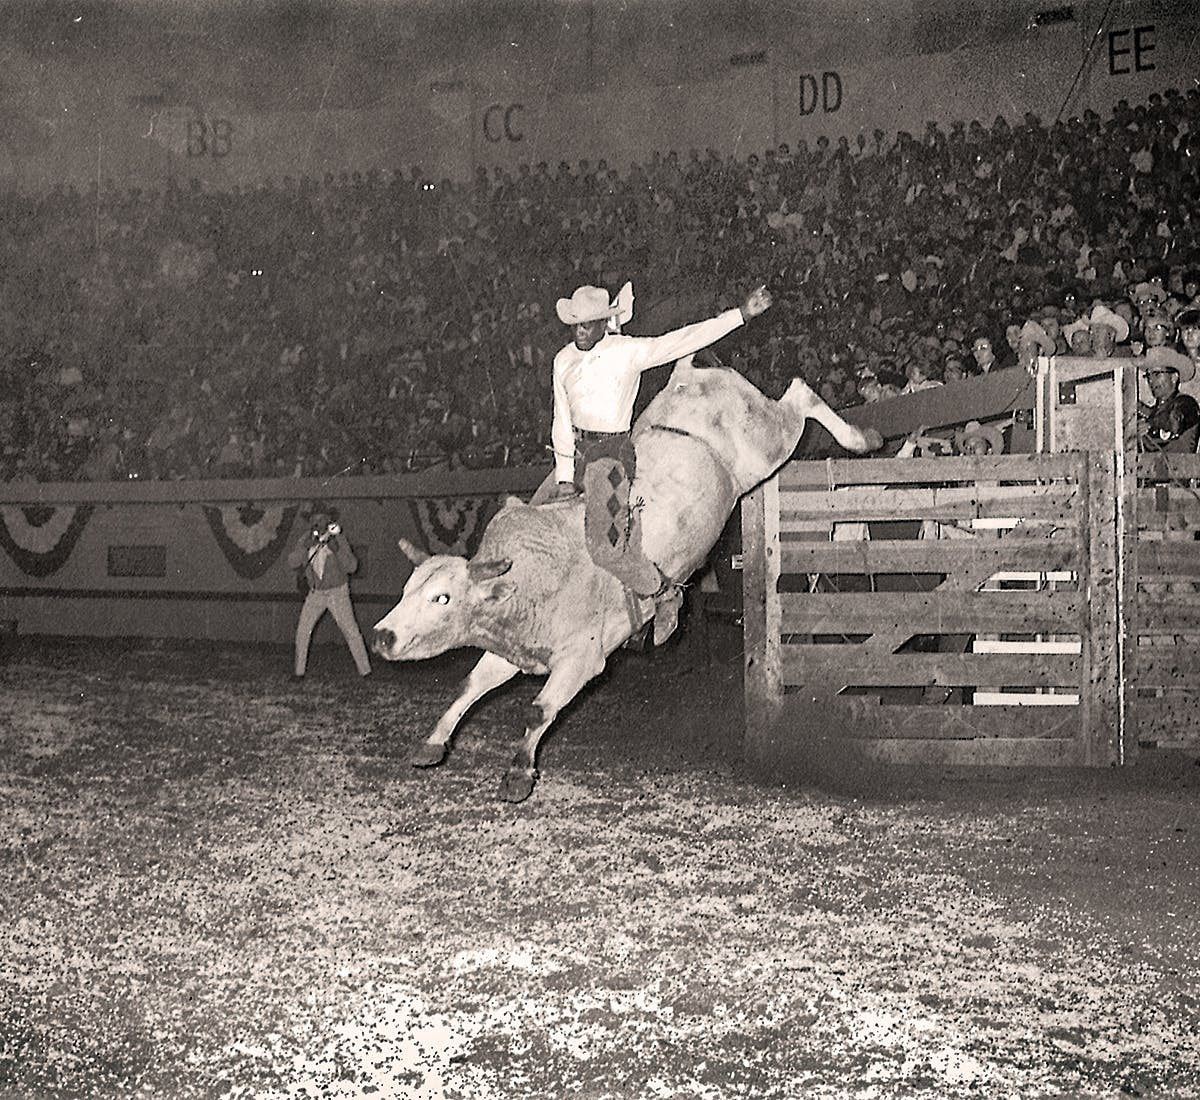 rodeo-Myrtis-Dightman-riding-bull-Oklahoma-city-196